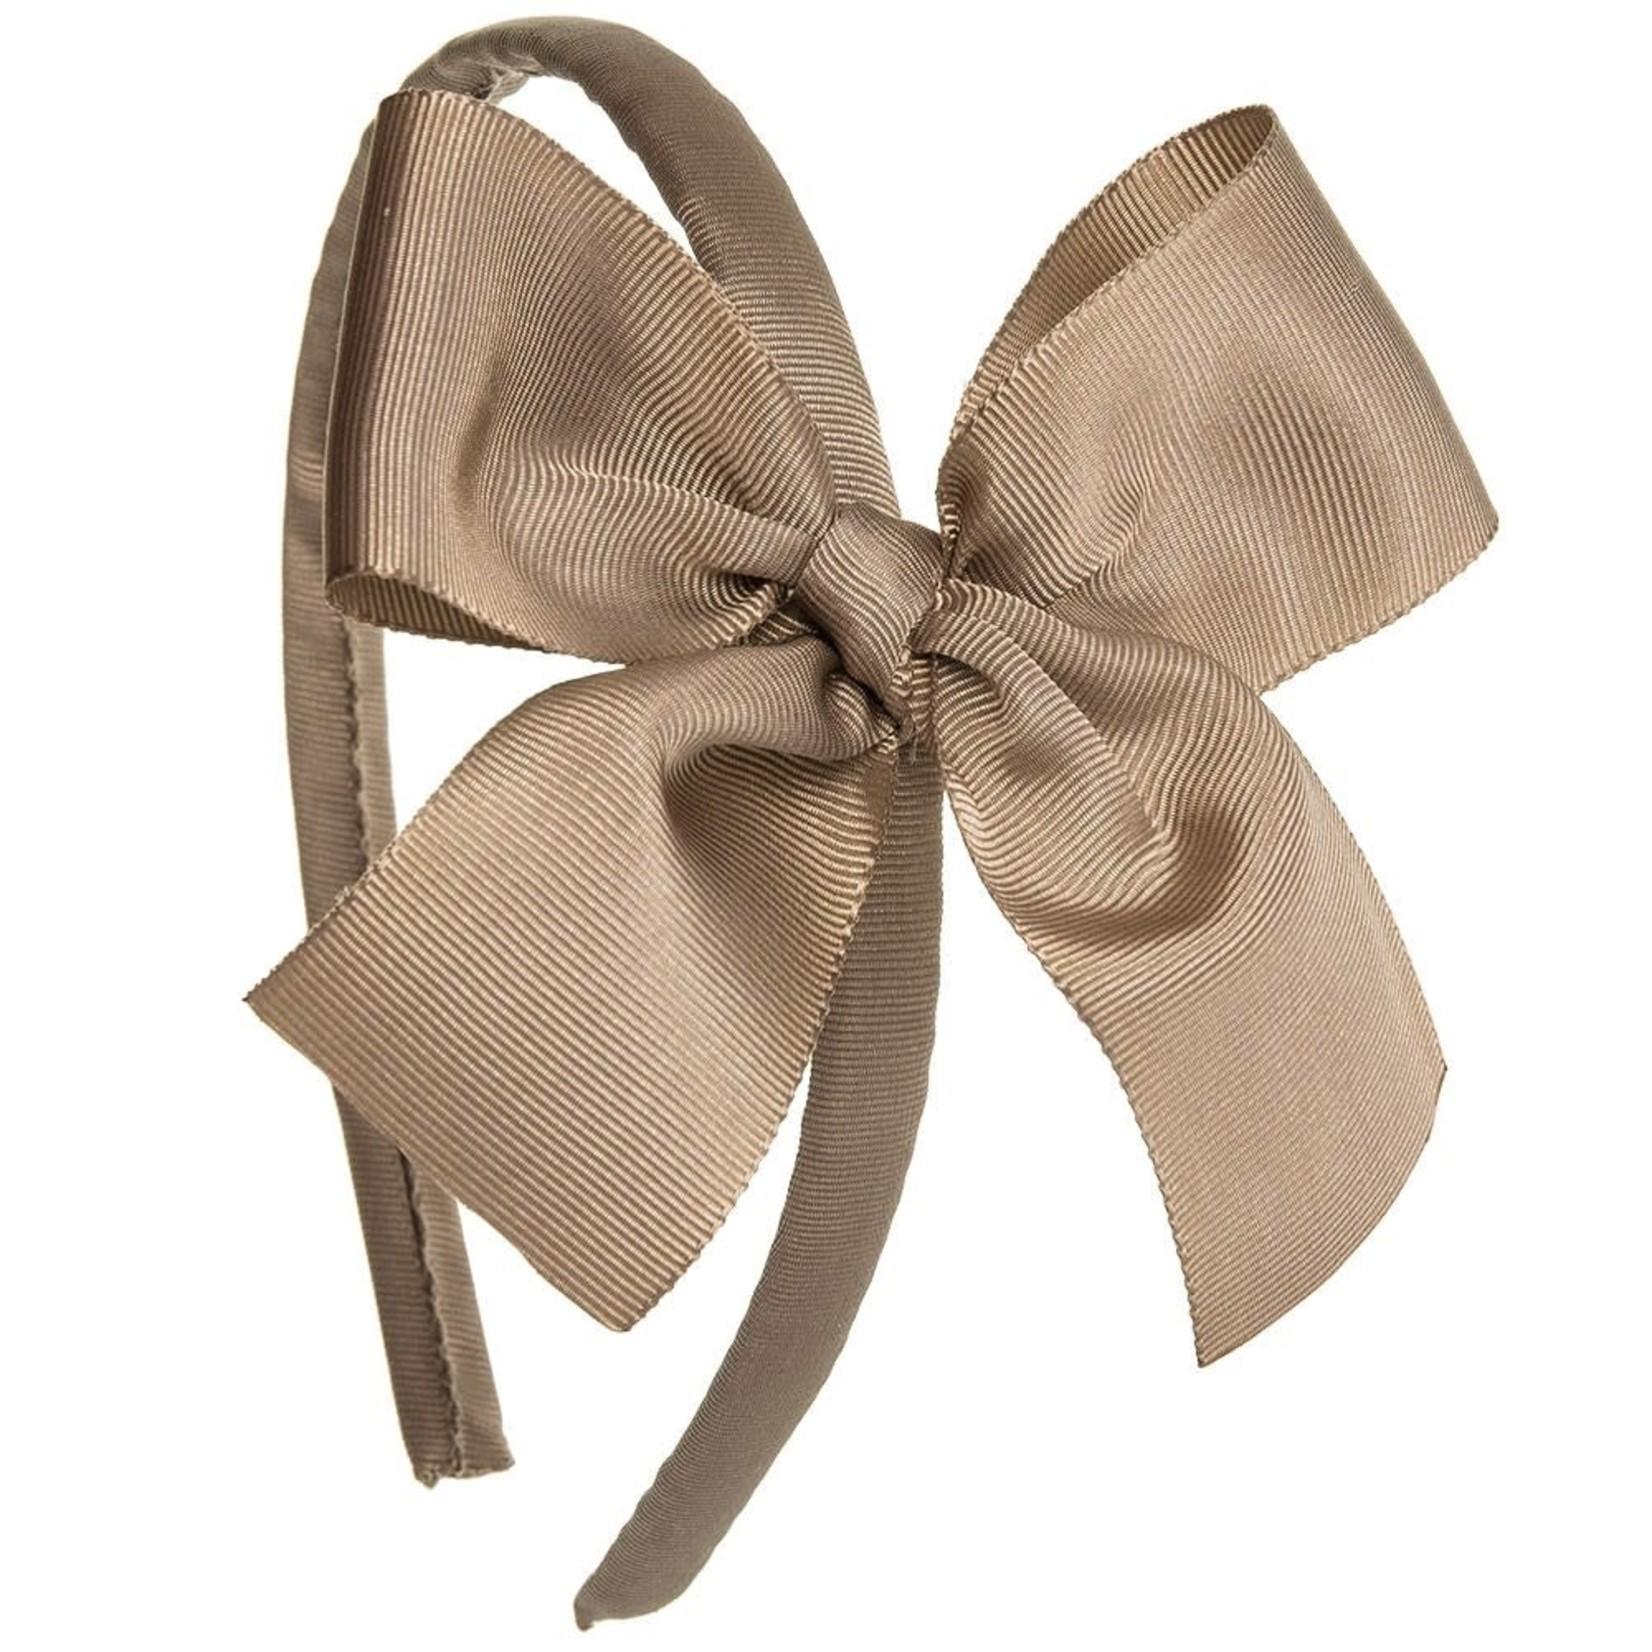 Siena Diadeem Large Bow - Brown